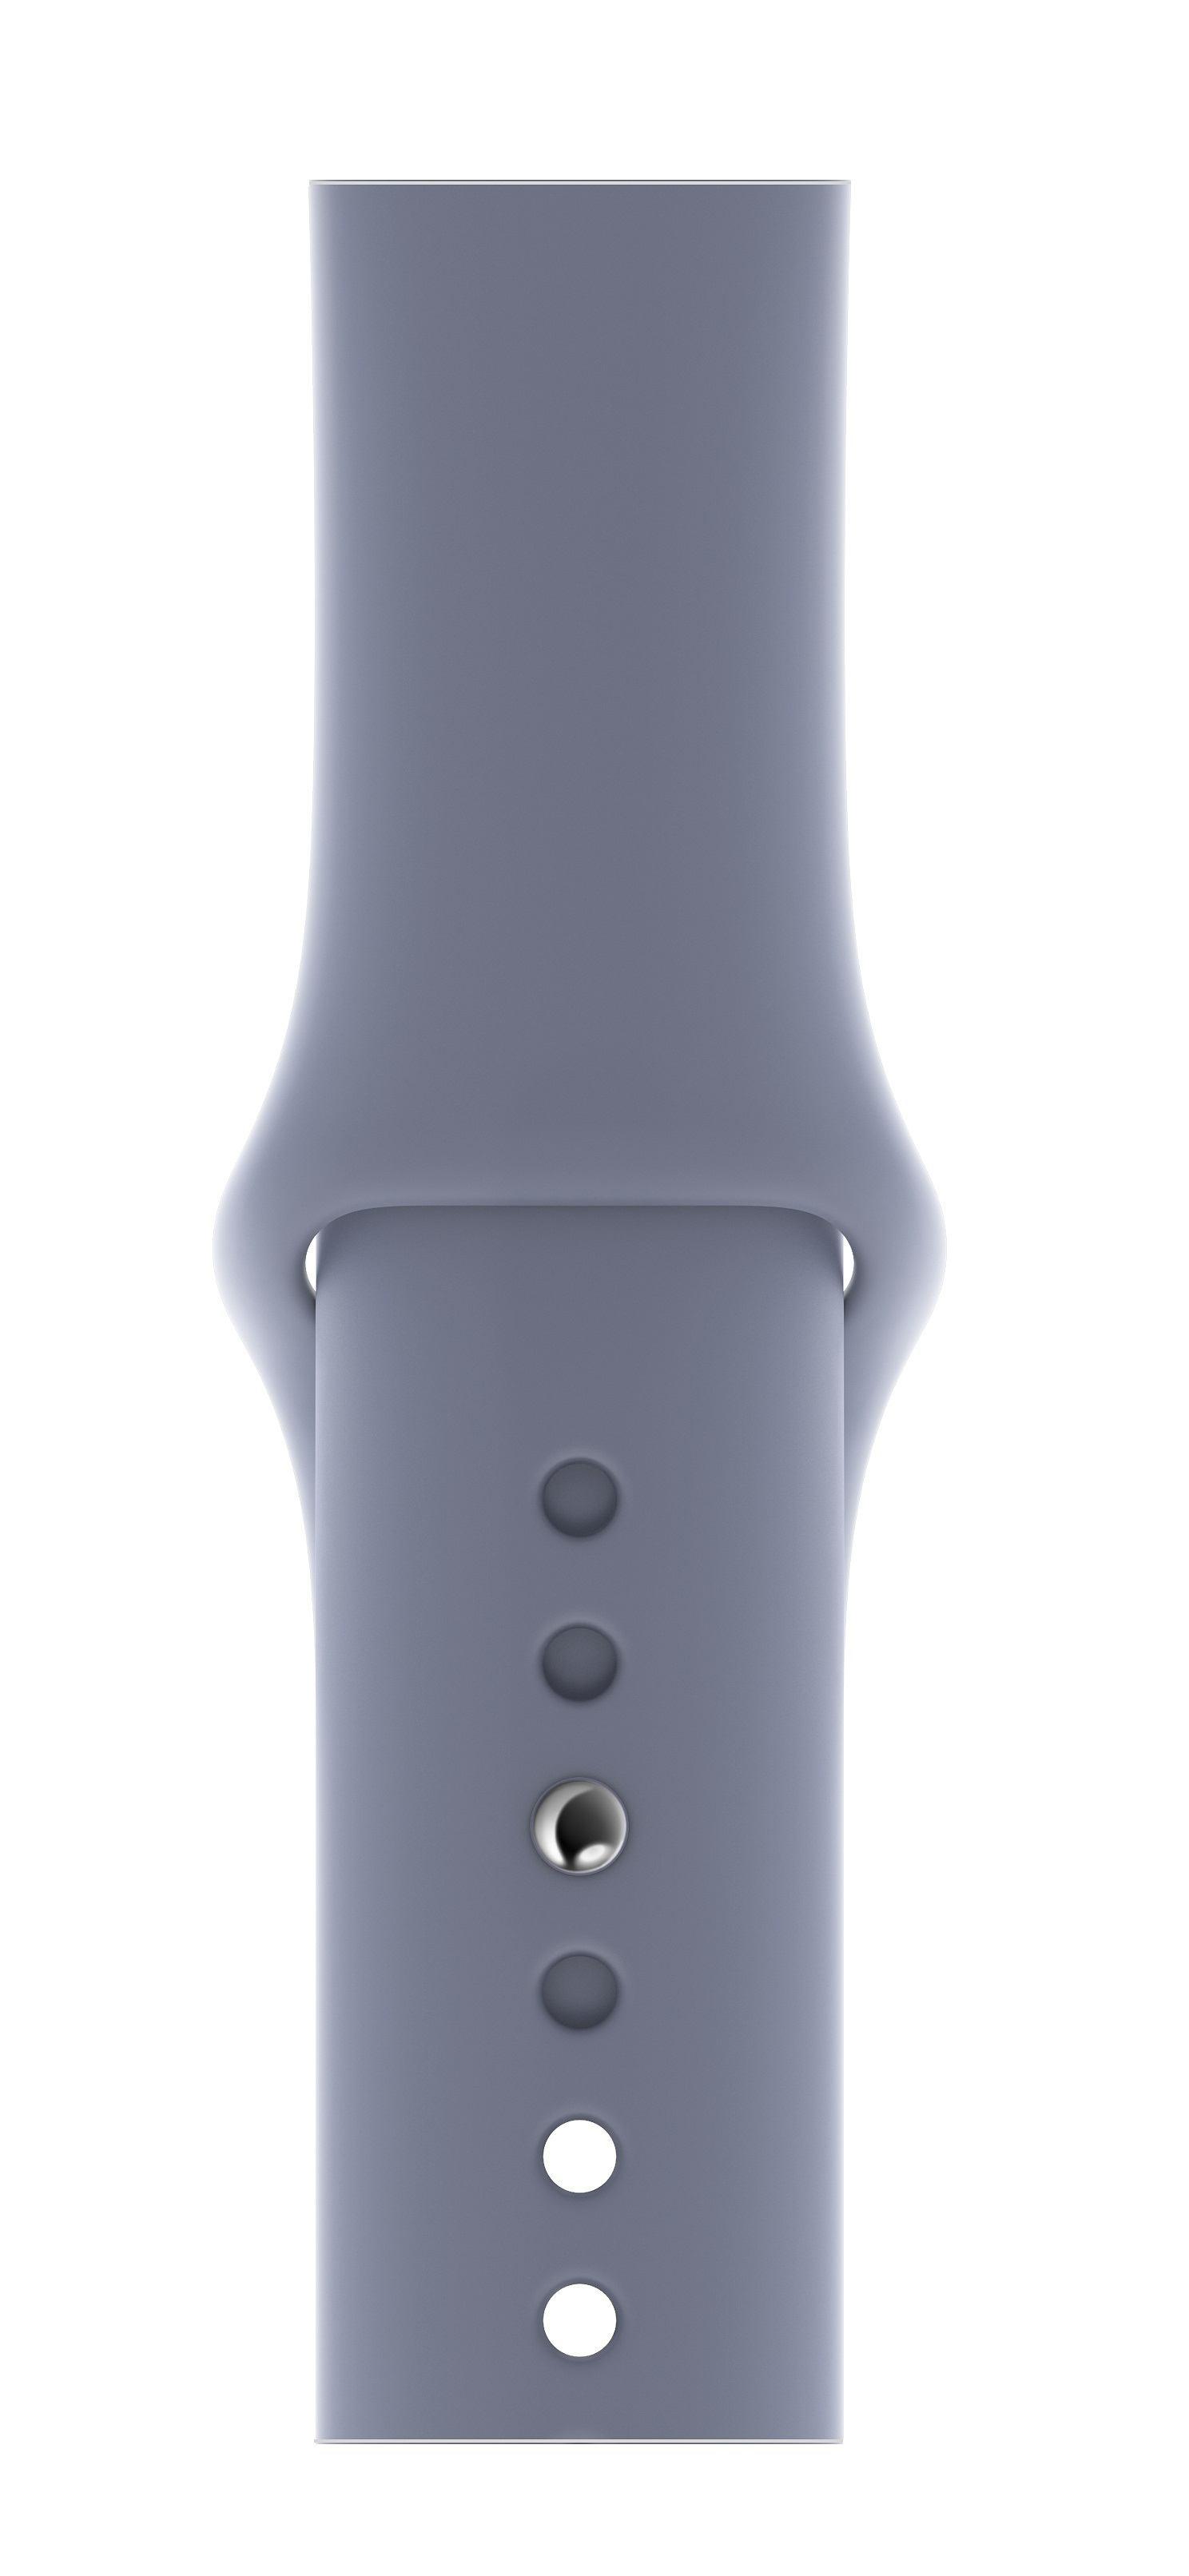 2022274-Apple-MTP92ZM-A-accessorio-per-smartwatch-Band-Lavanda-Fluoroelastomero